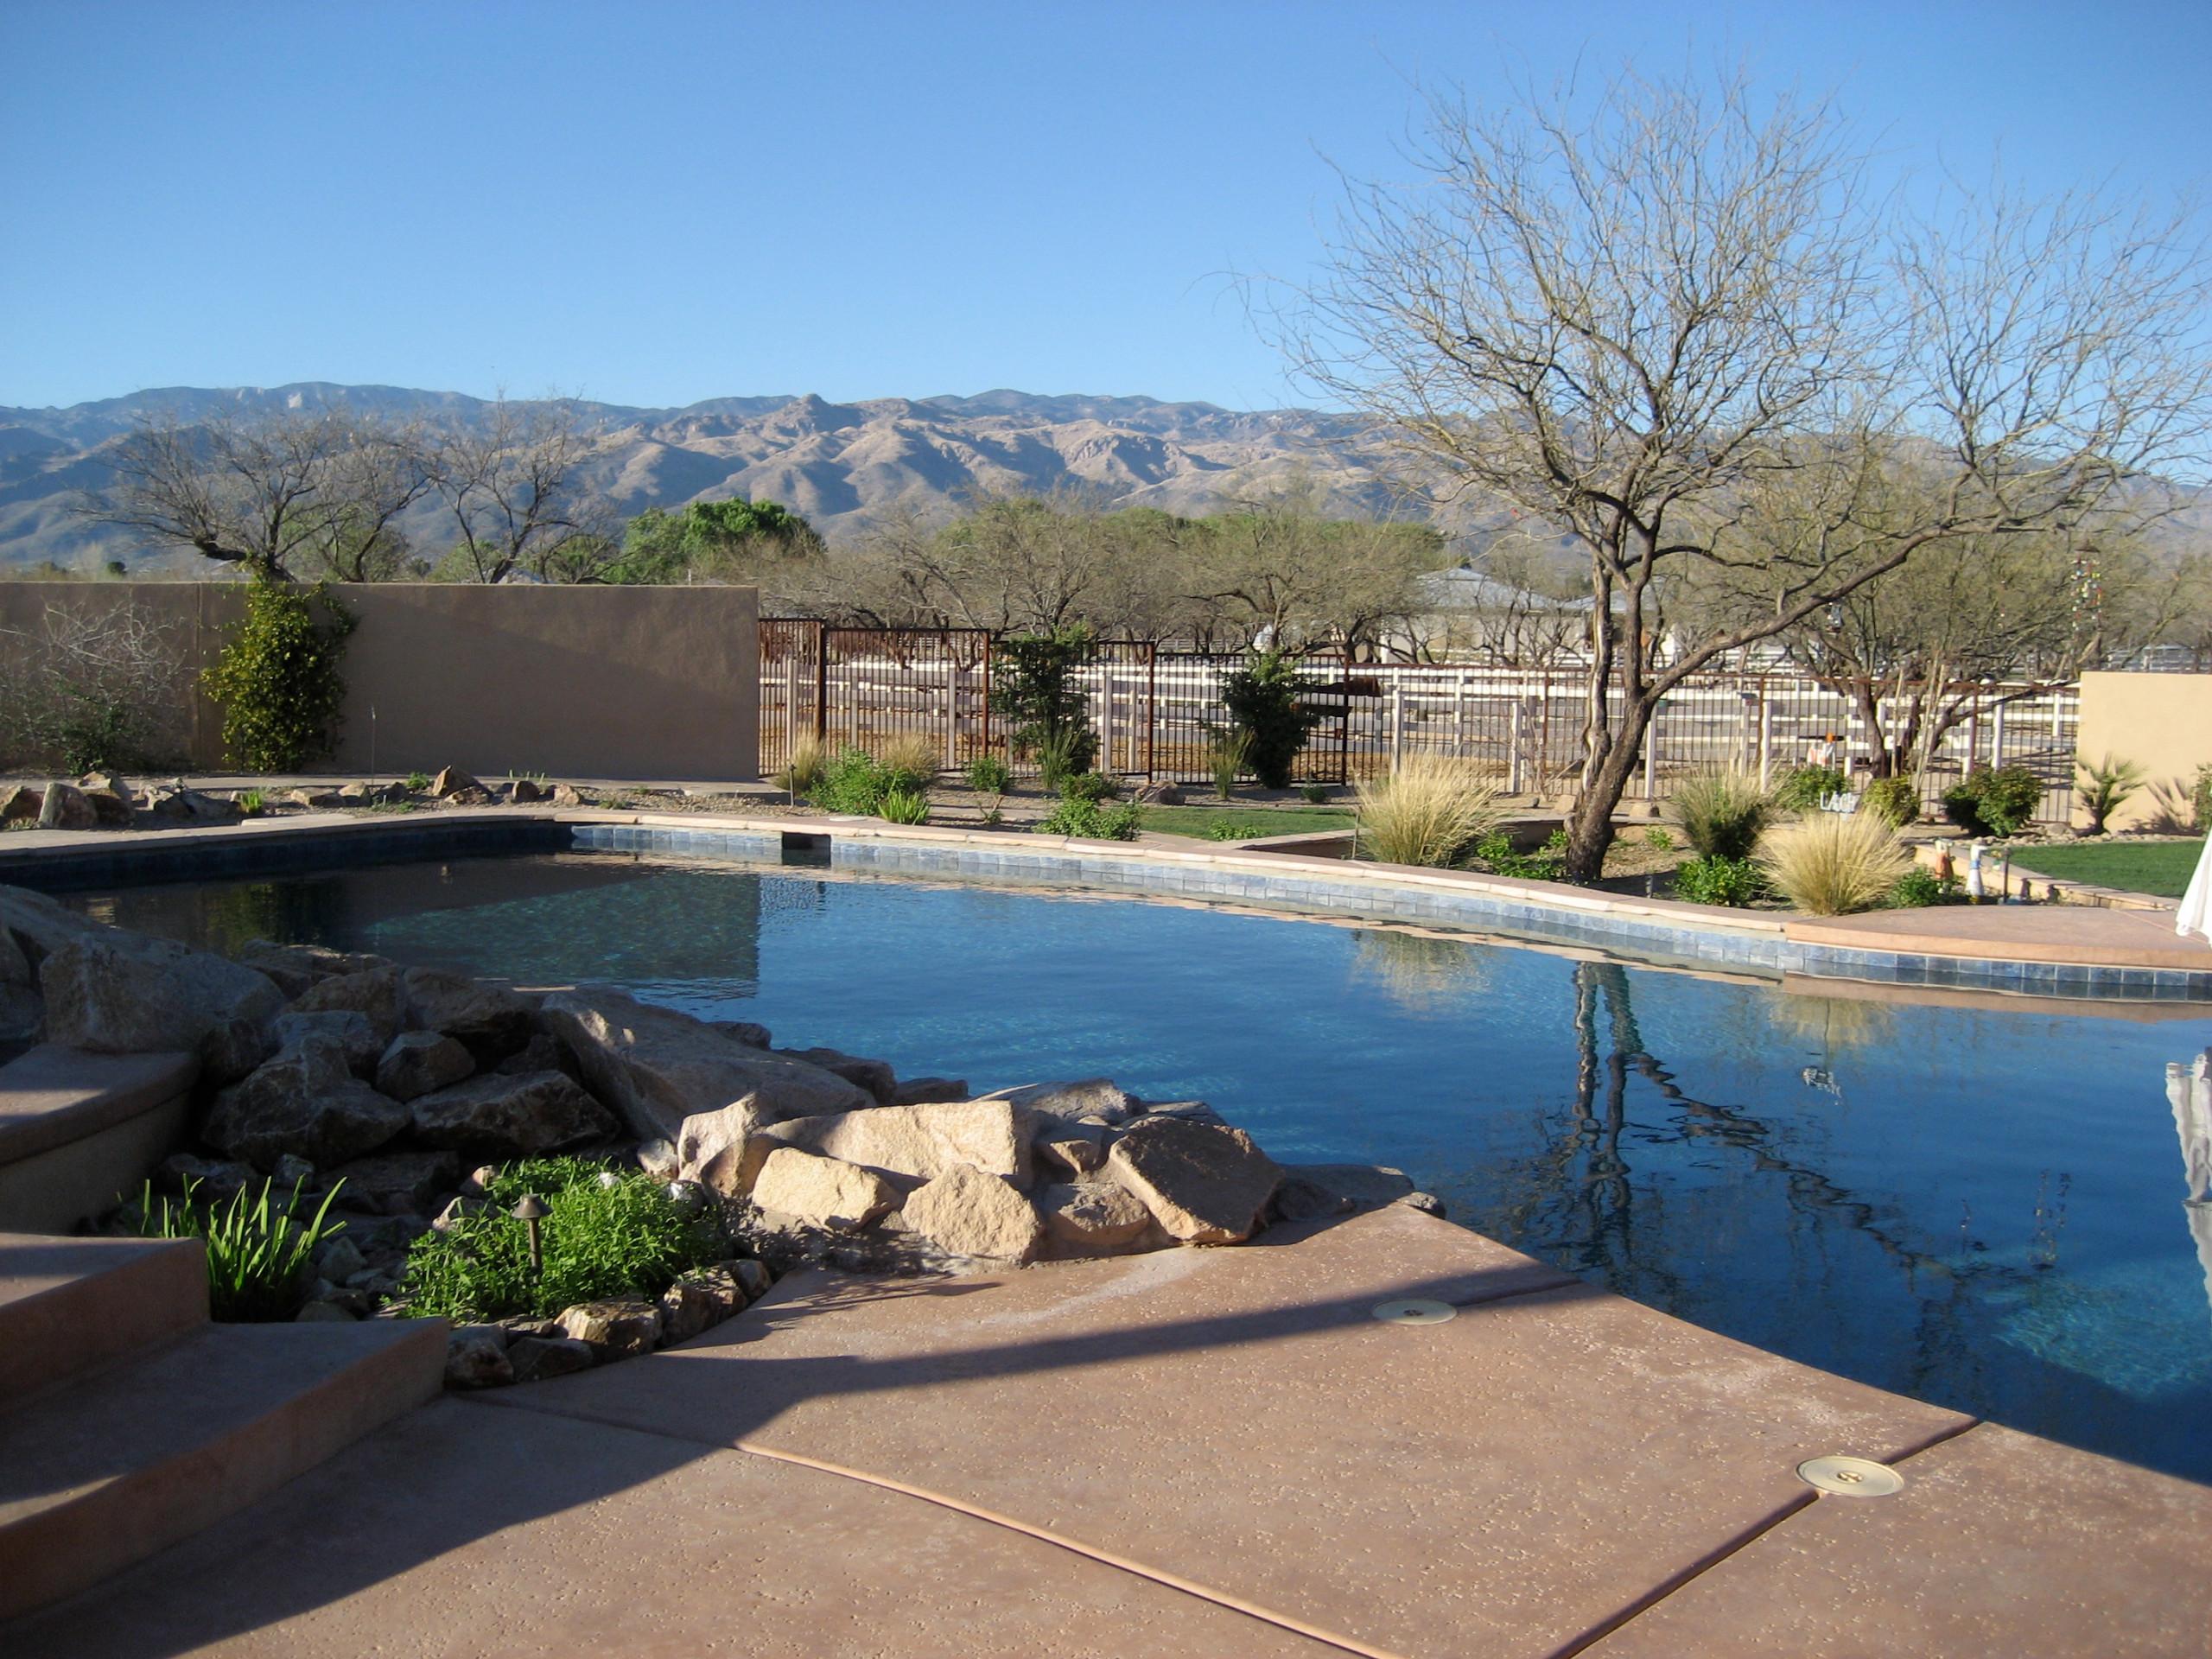 Tanque Verde Pool